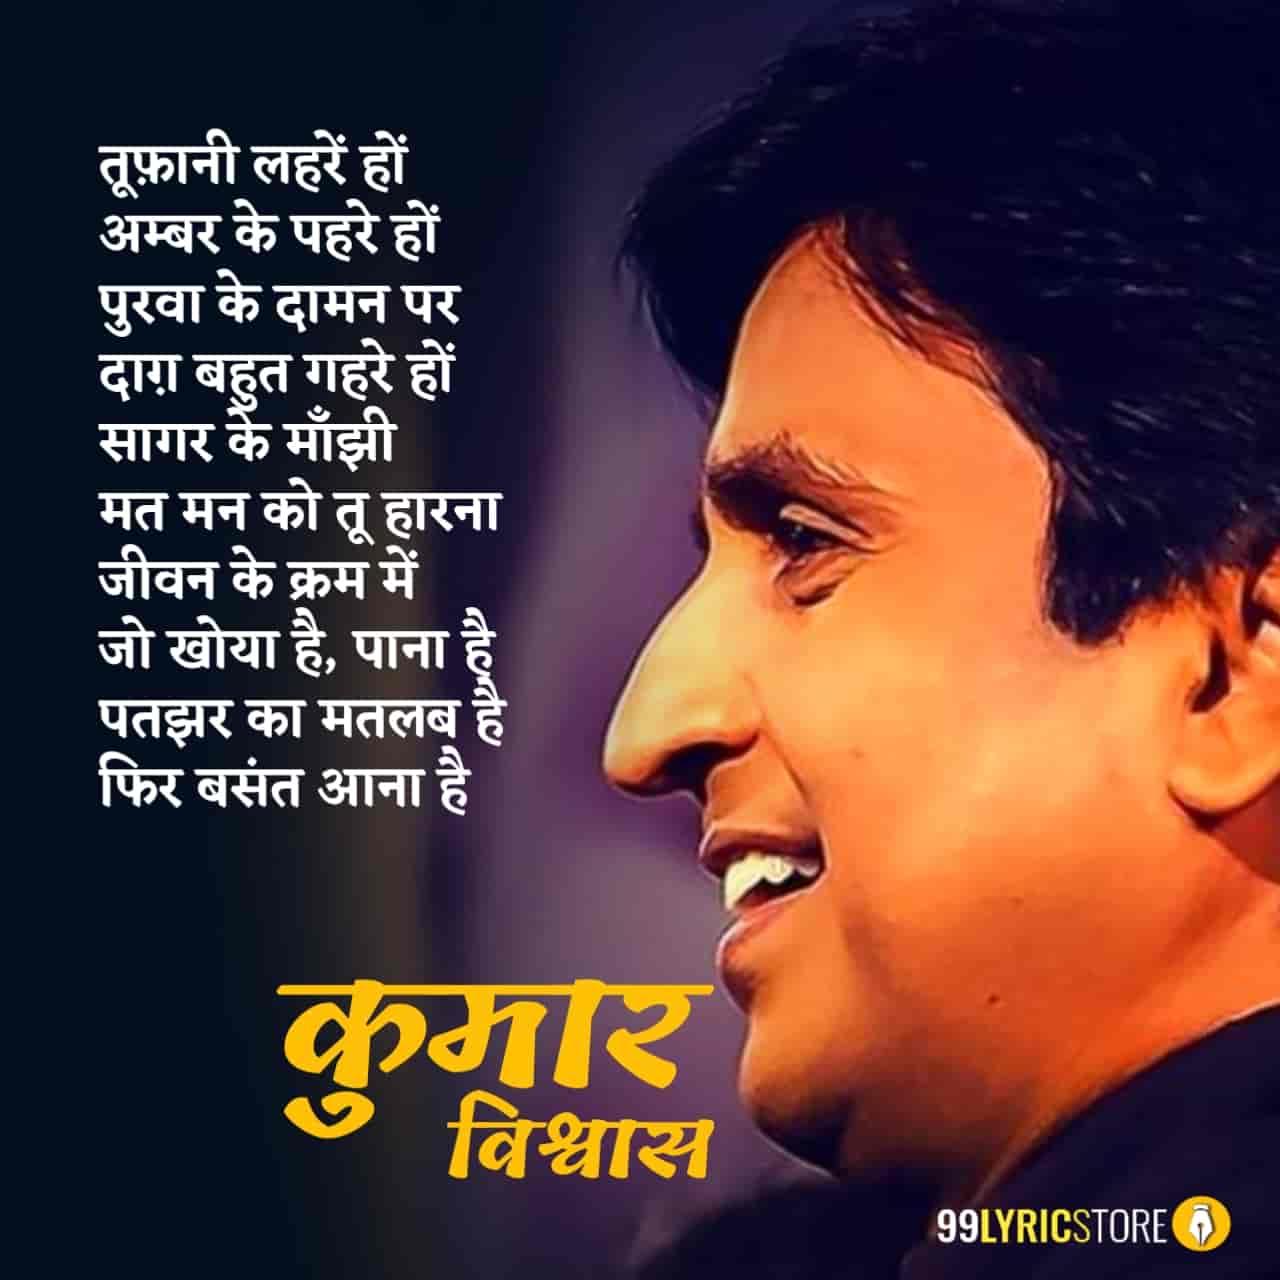 This beautiful hindi poem 'Phir Basant Aana Hai' which is written by Kumar Vishwas.